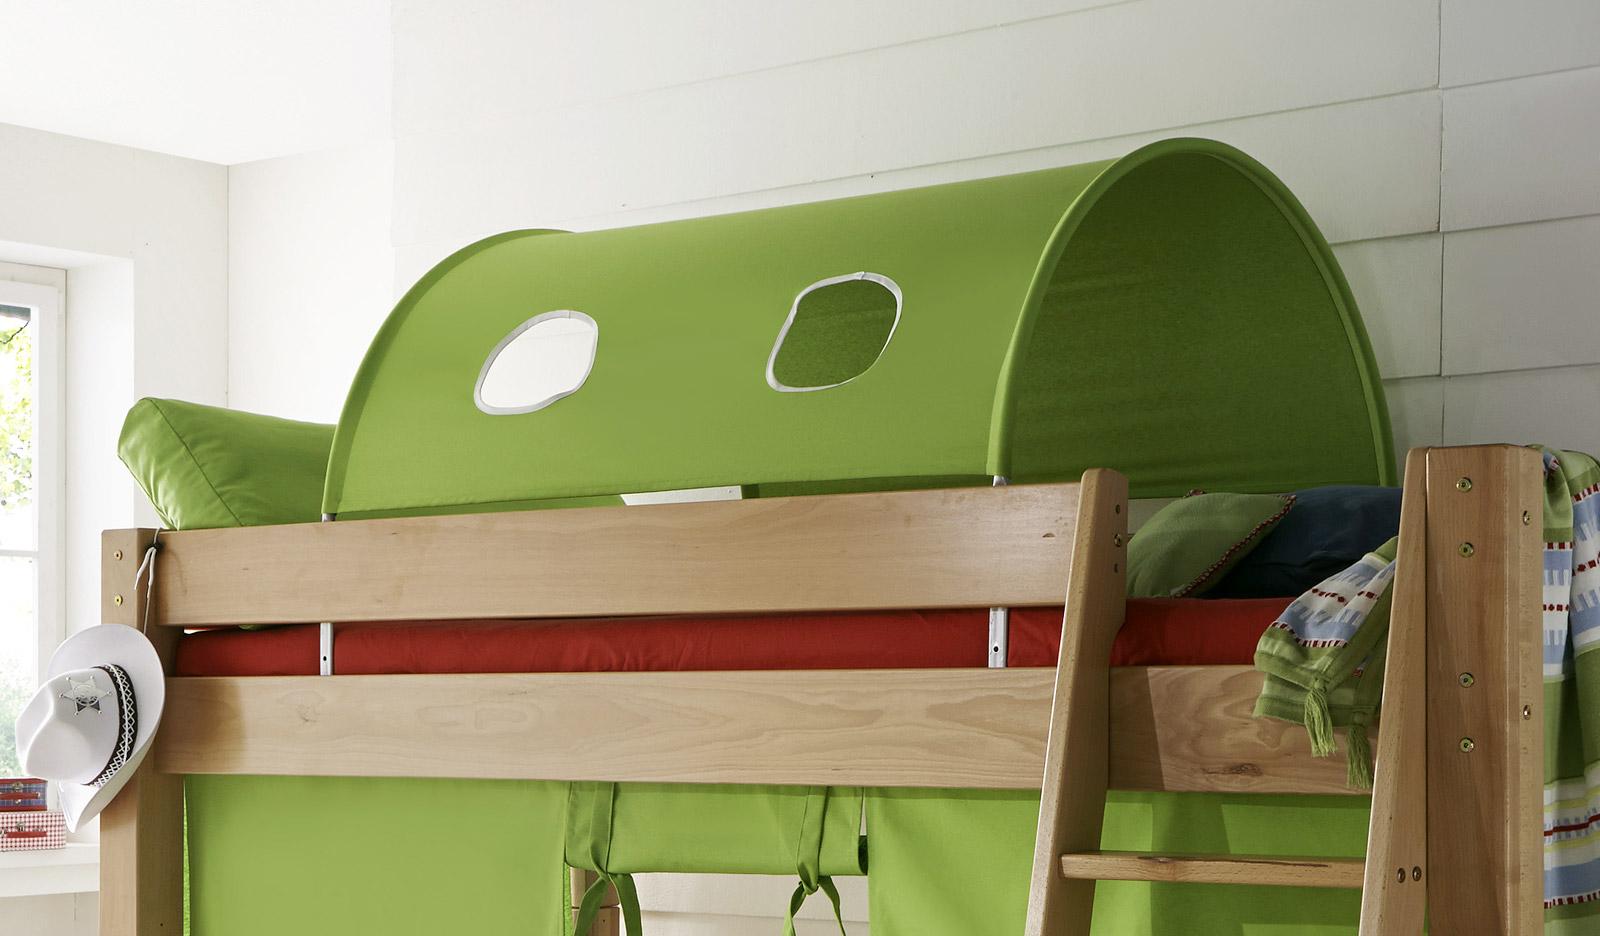 tolles kinderhochbett mit leiter kids fantasy. Black Bedroom Furniture Sets. Home Design Ideas